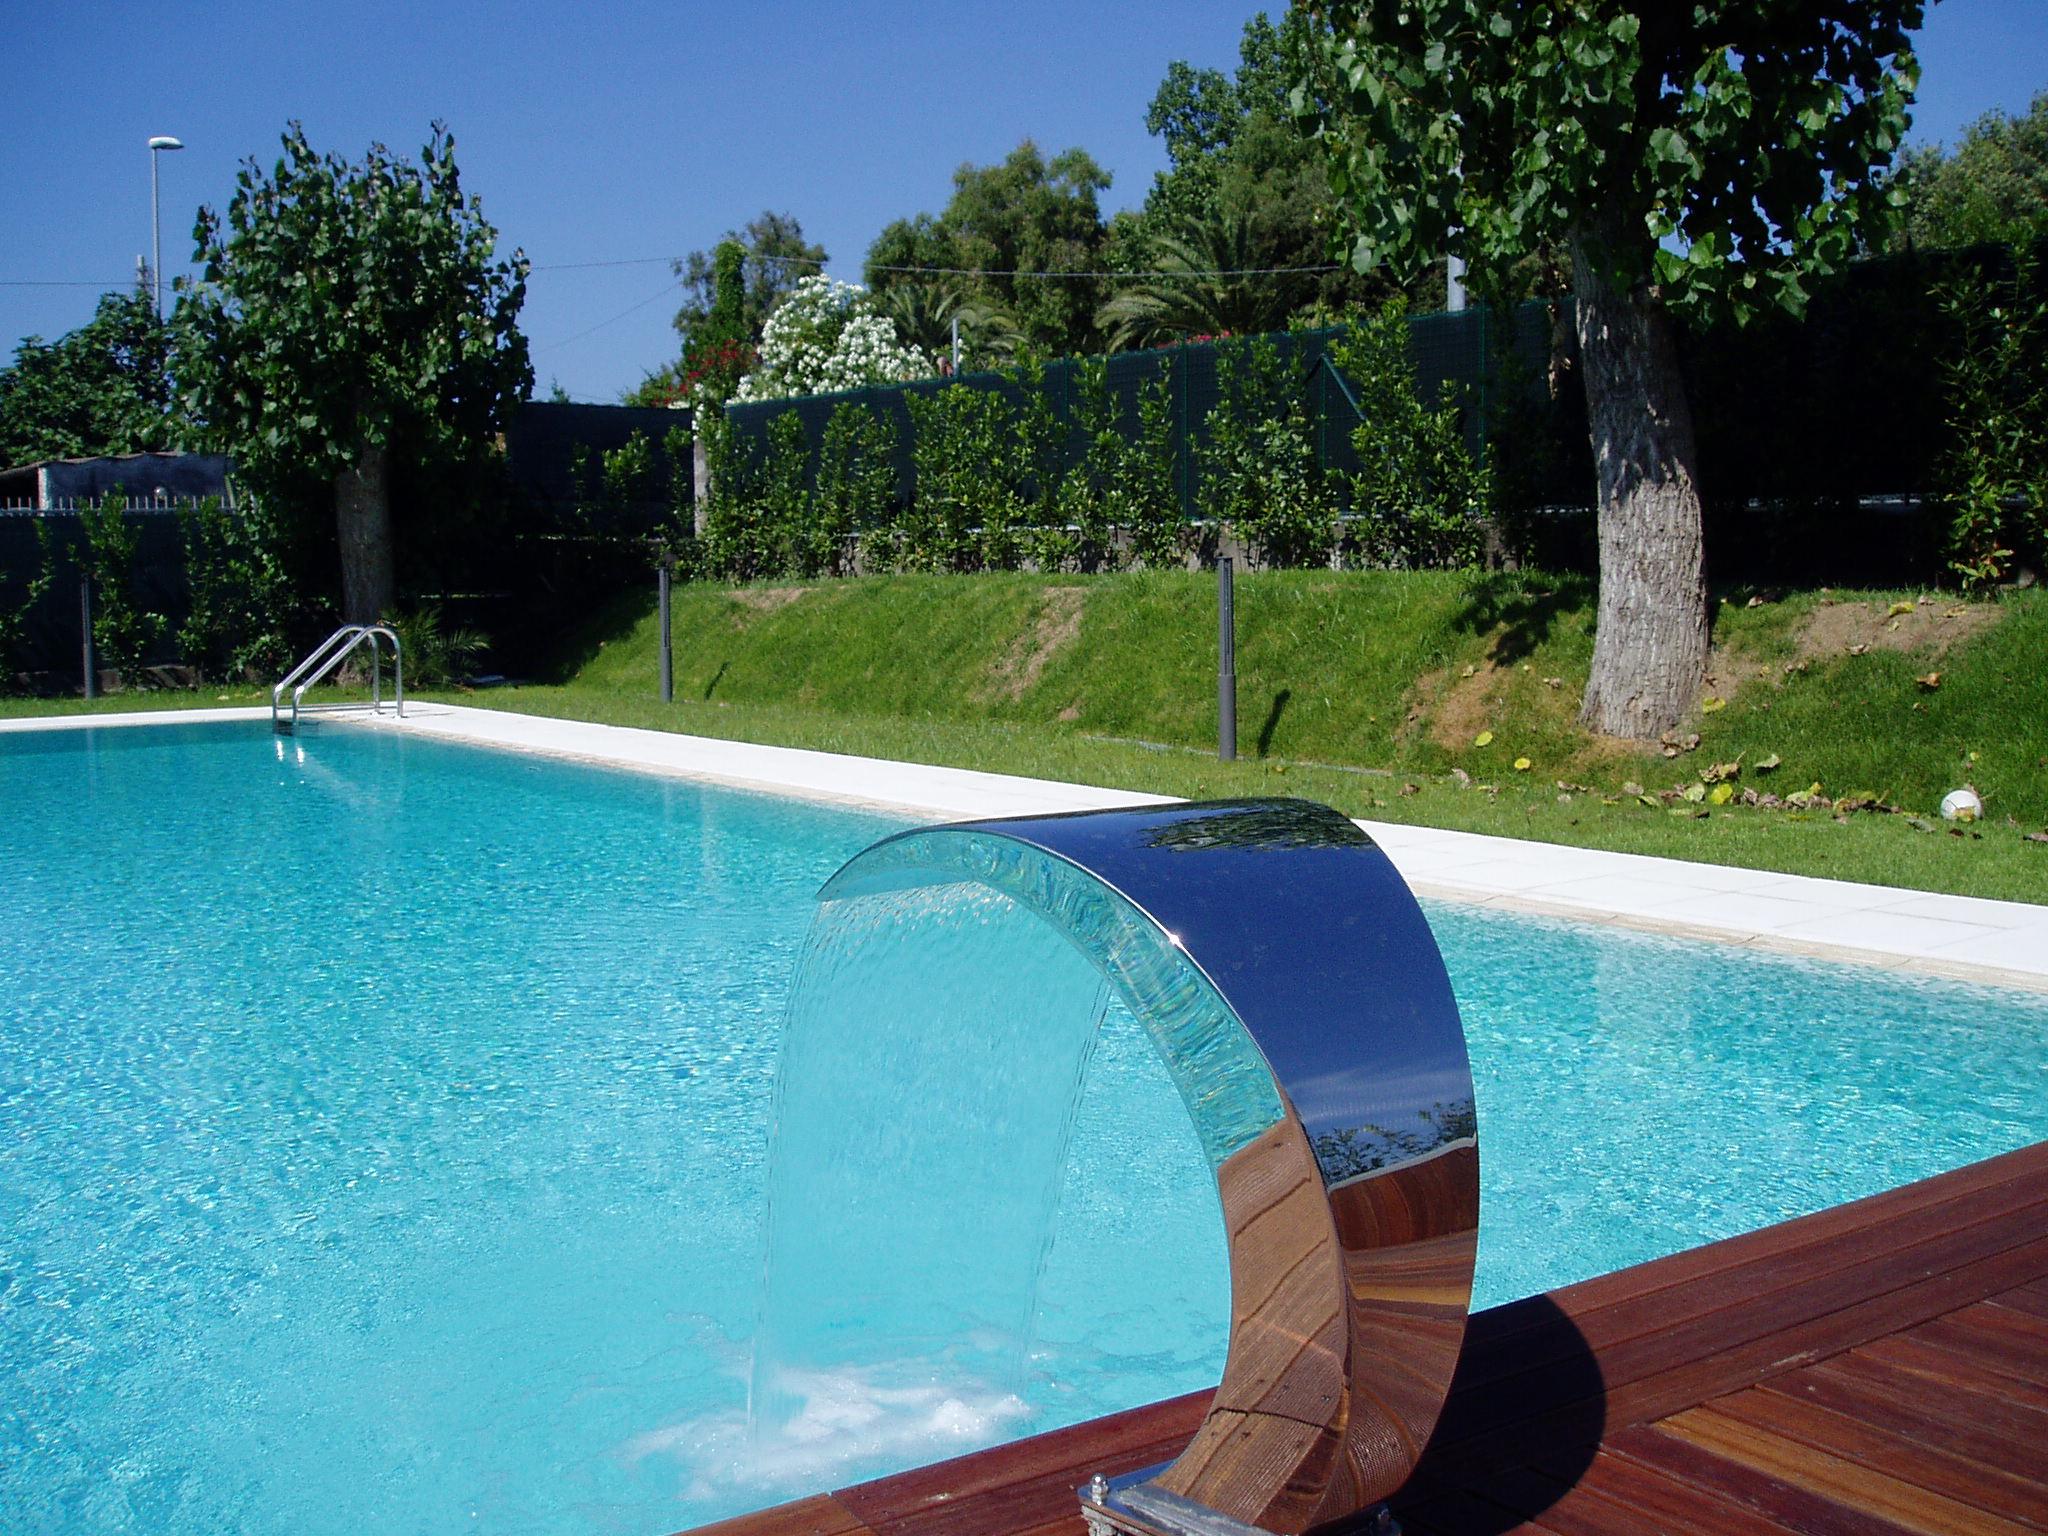 Piscina hotel marina di massa hotel patriziahotel patrizia - Bordo piscina prezzi ...